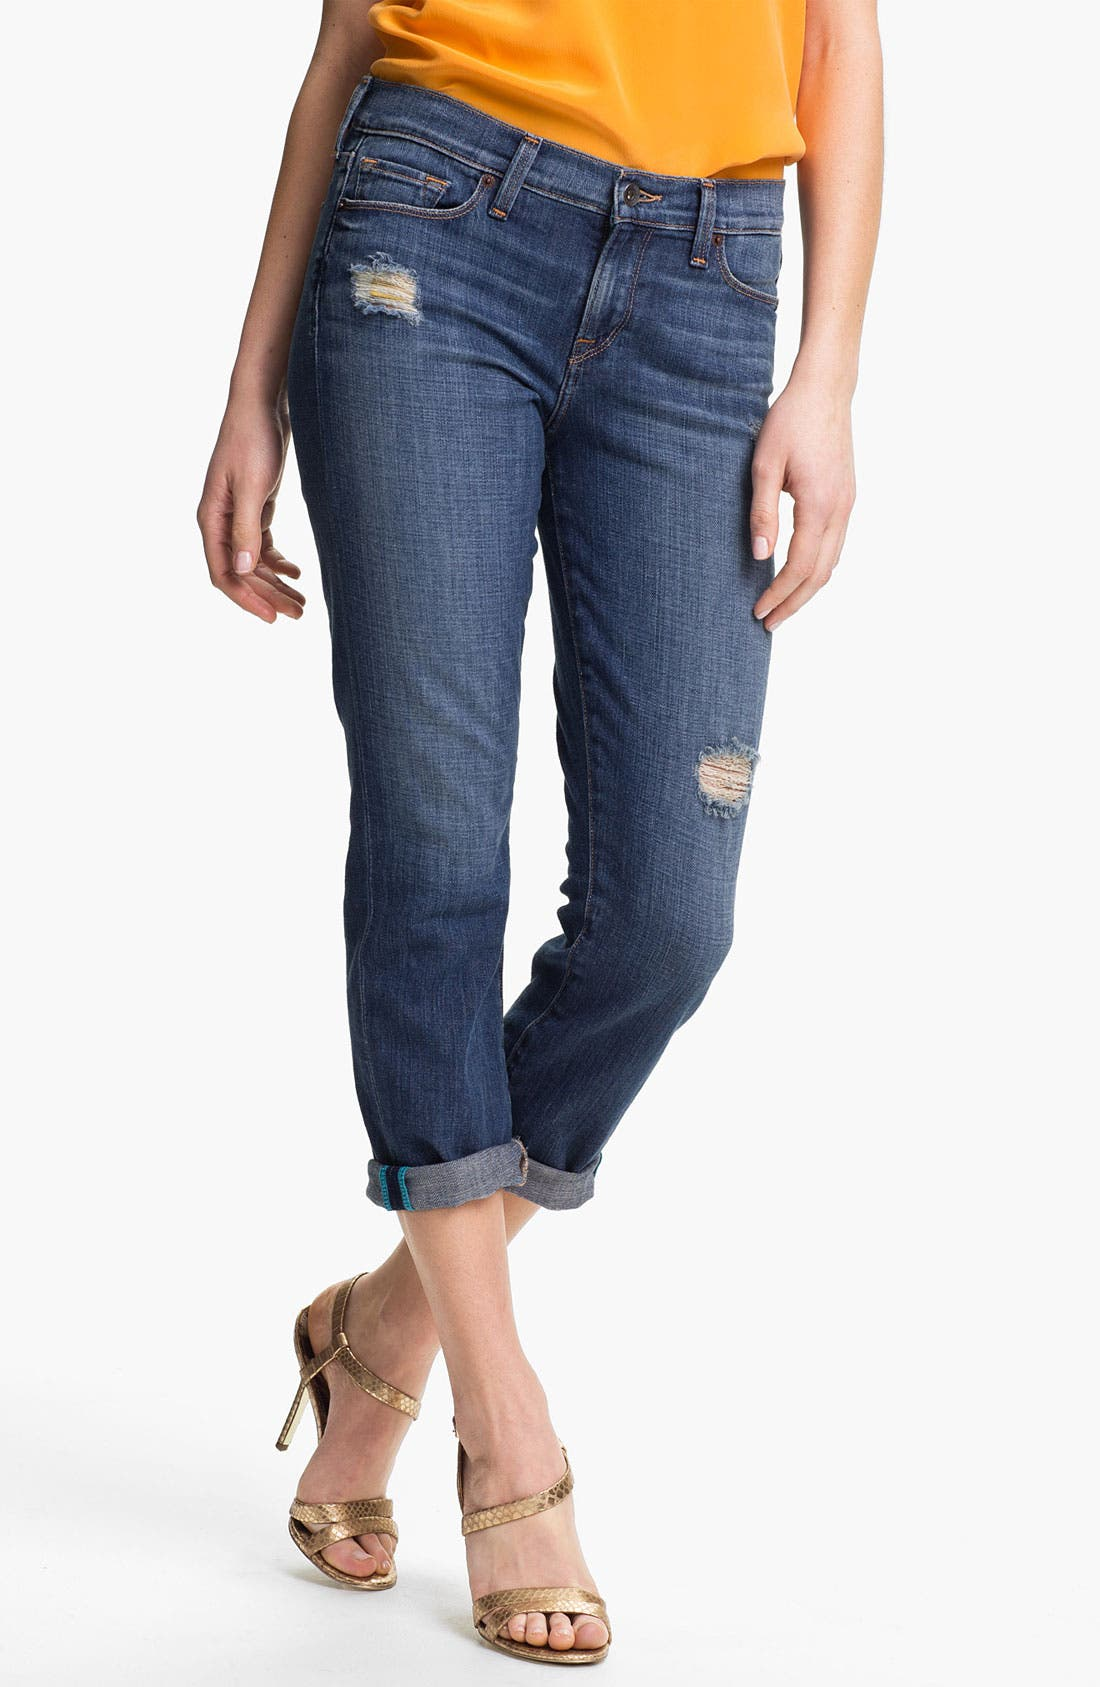 Alternate Image 1 Selected - Lucky Brand Boyfriend Jeans (Chloe)